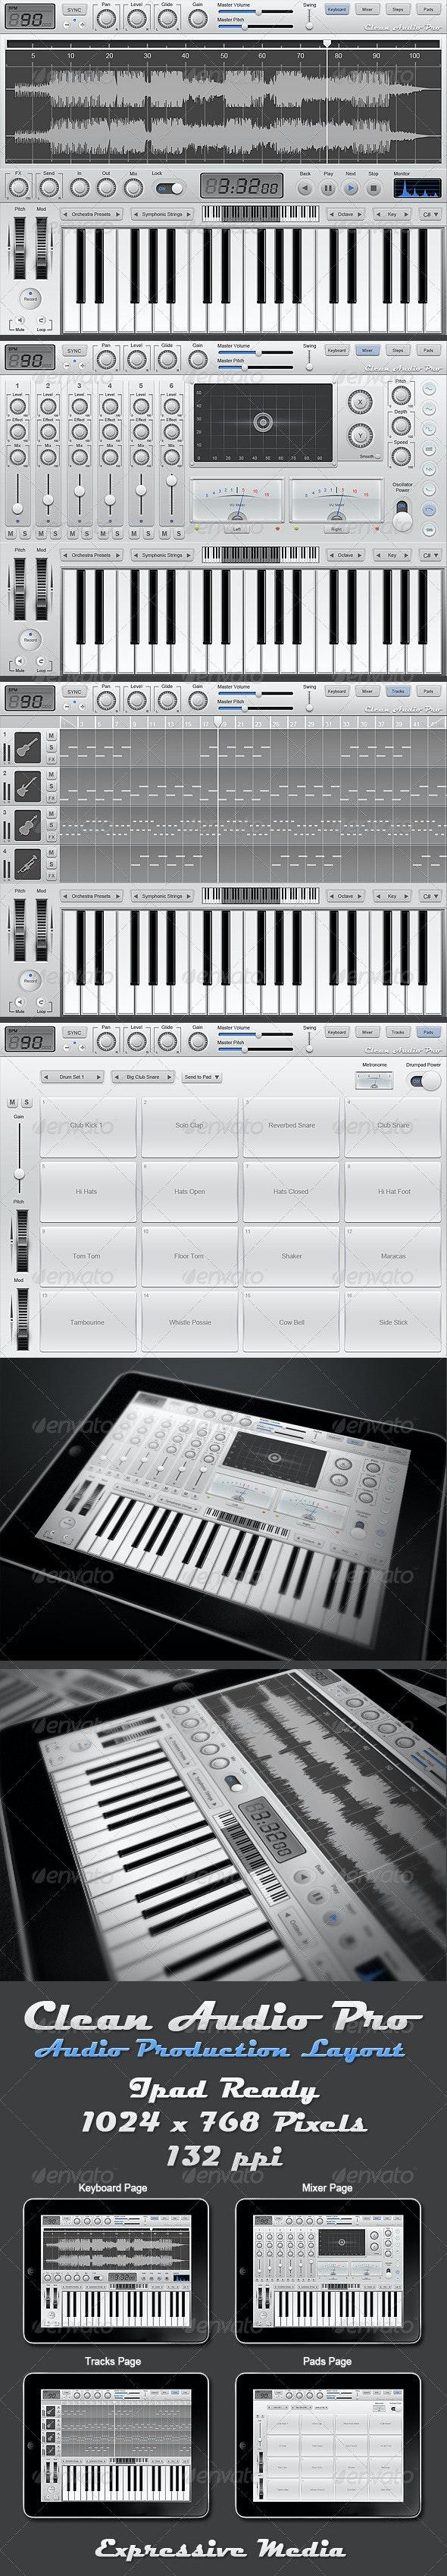 Clean Audio Pro